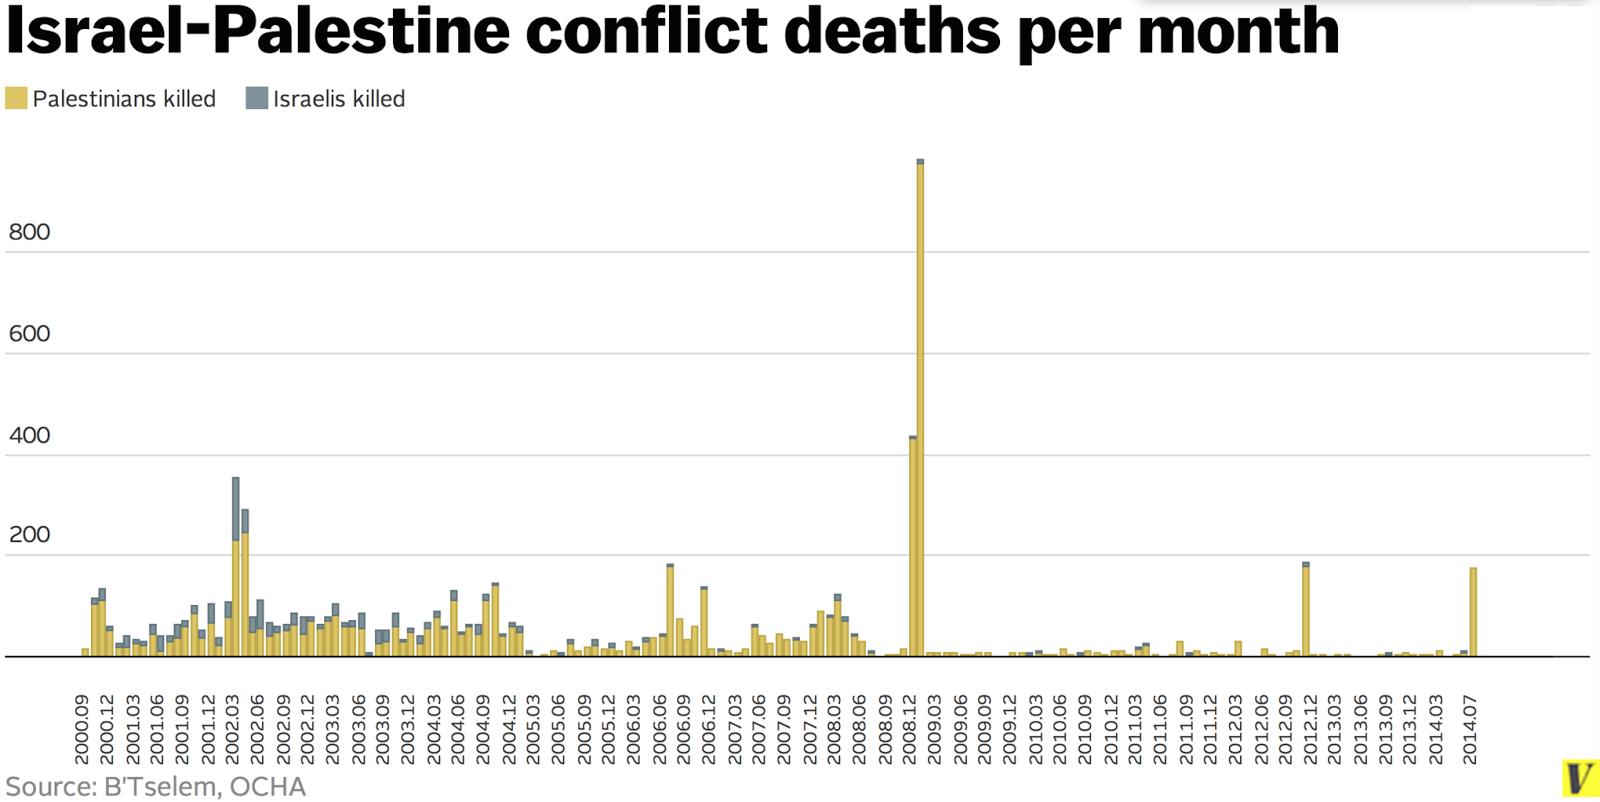 Palestinian vs Israeli deaths since 2000